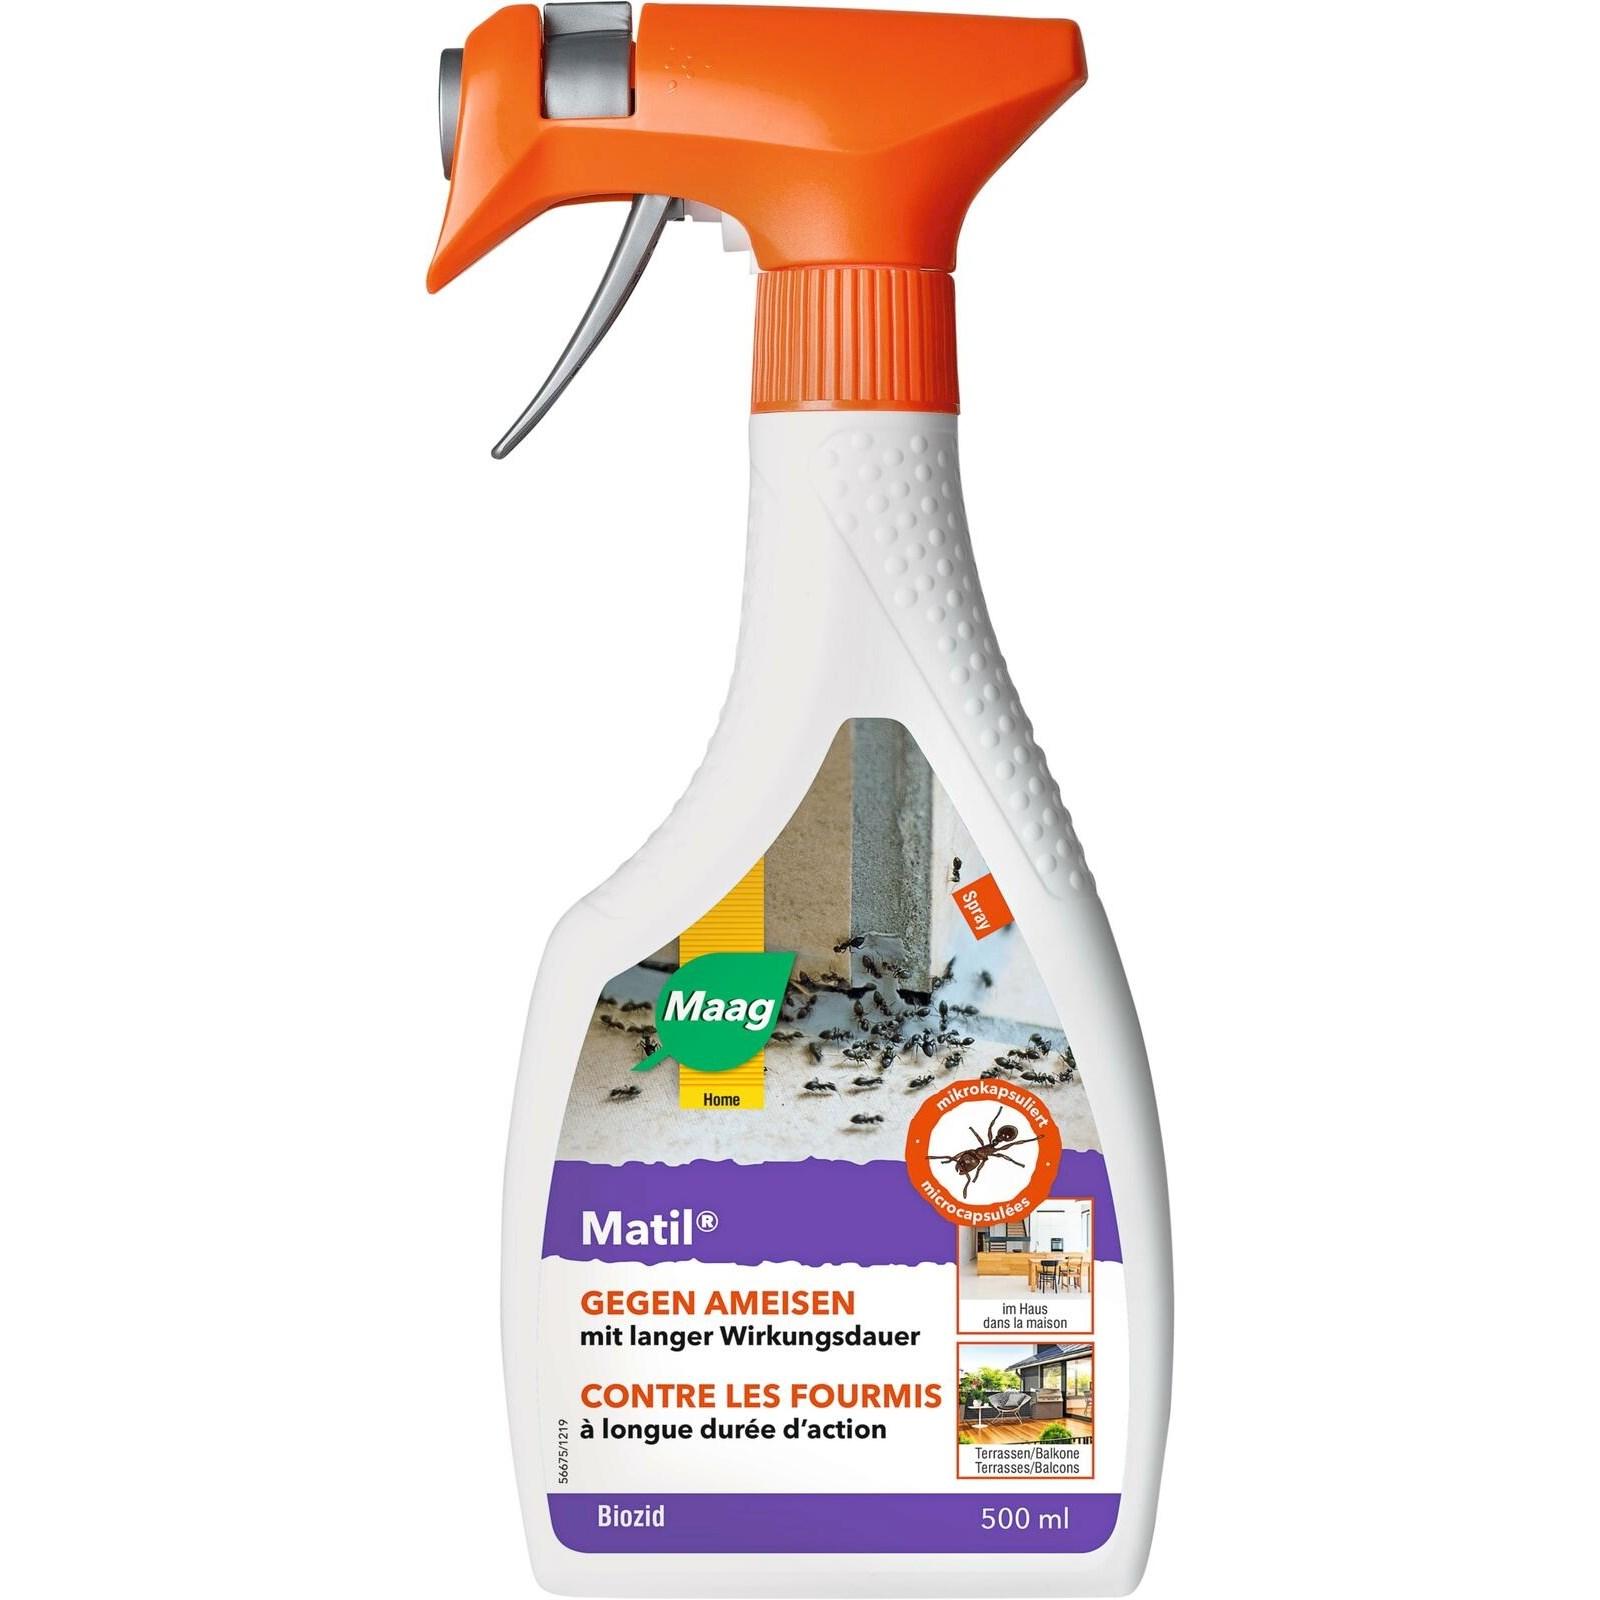 Ameisenspray Matil Maag 500 Ml Garteninsektizide Landi